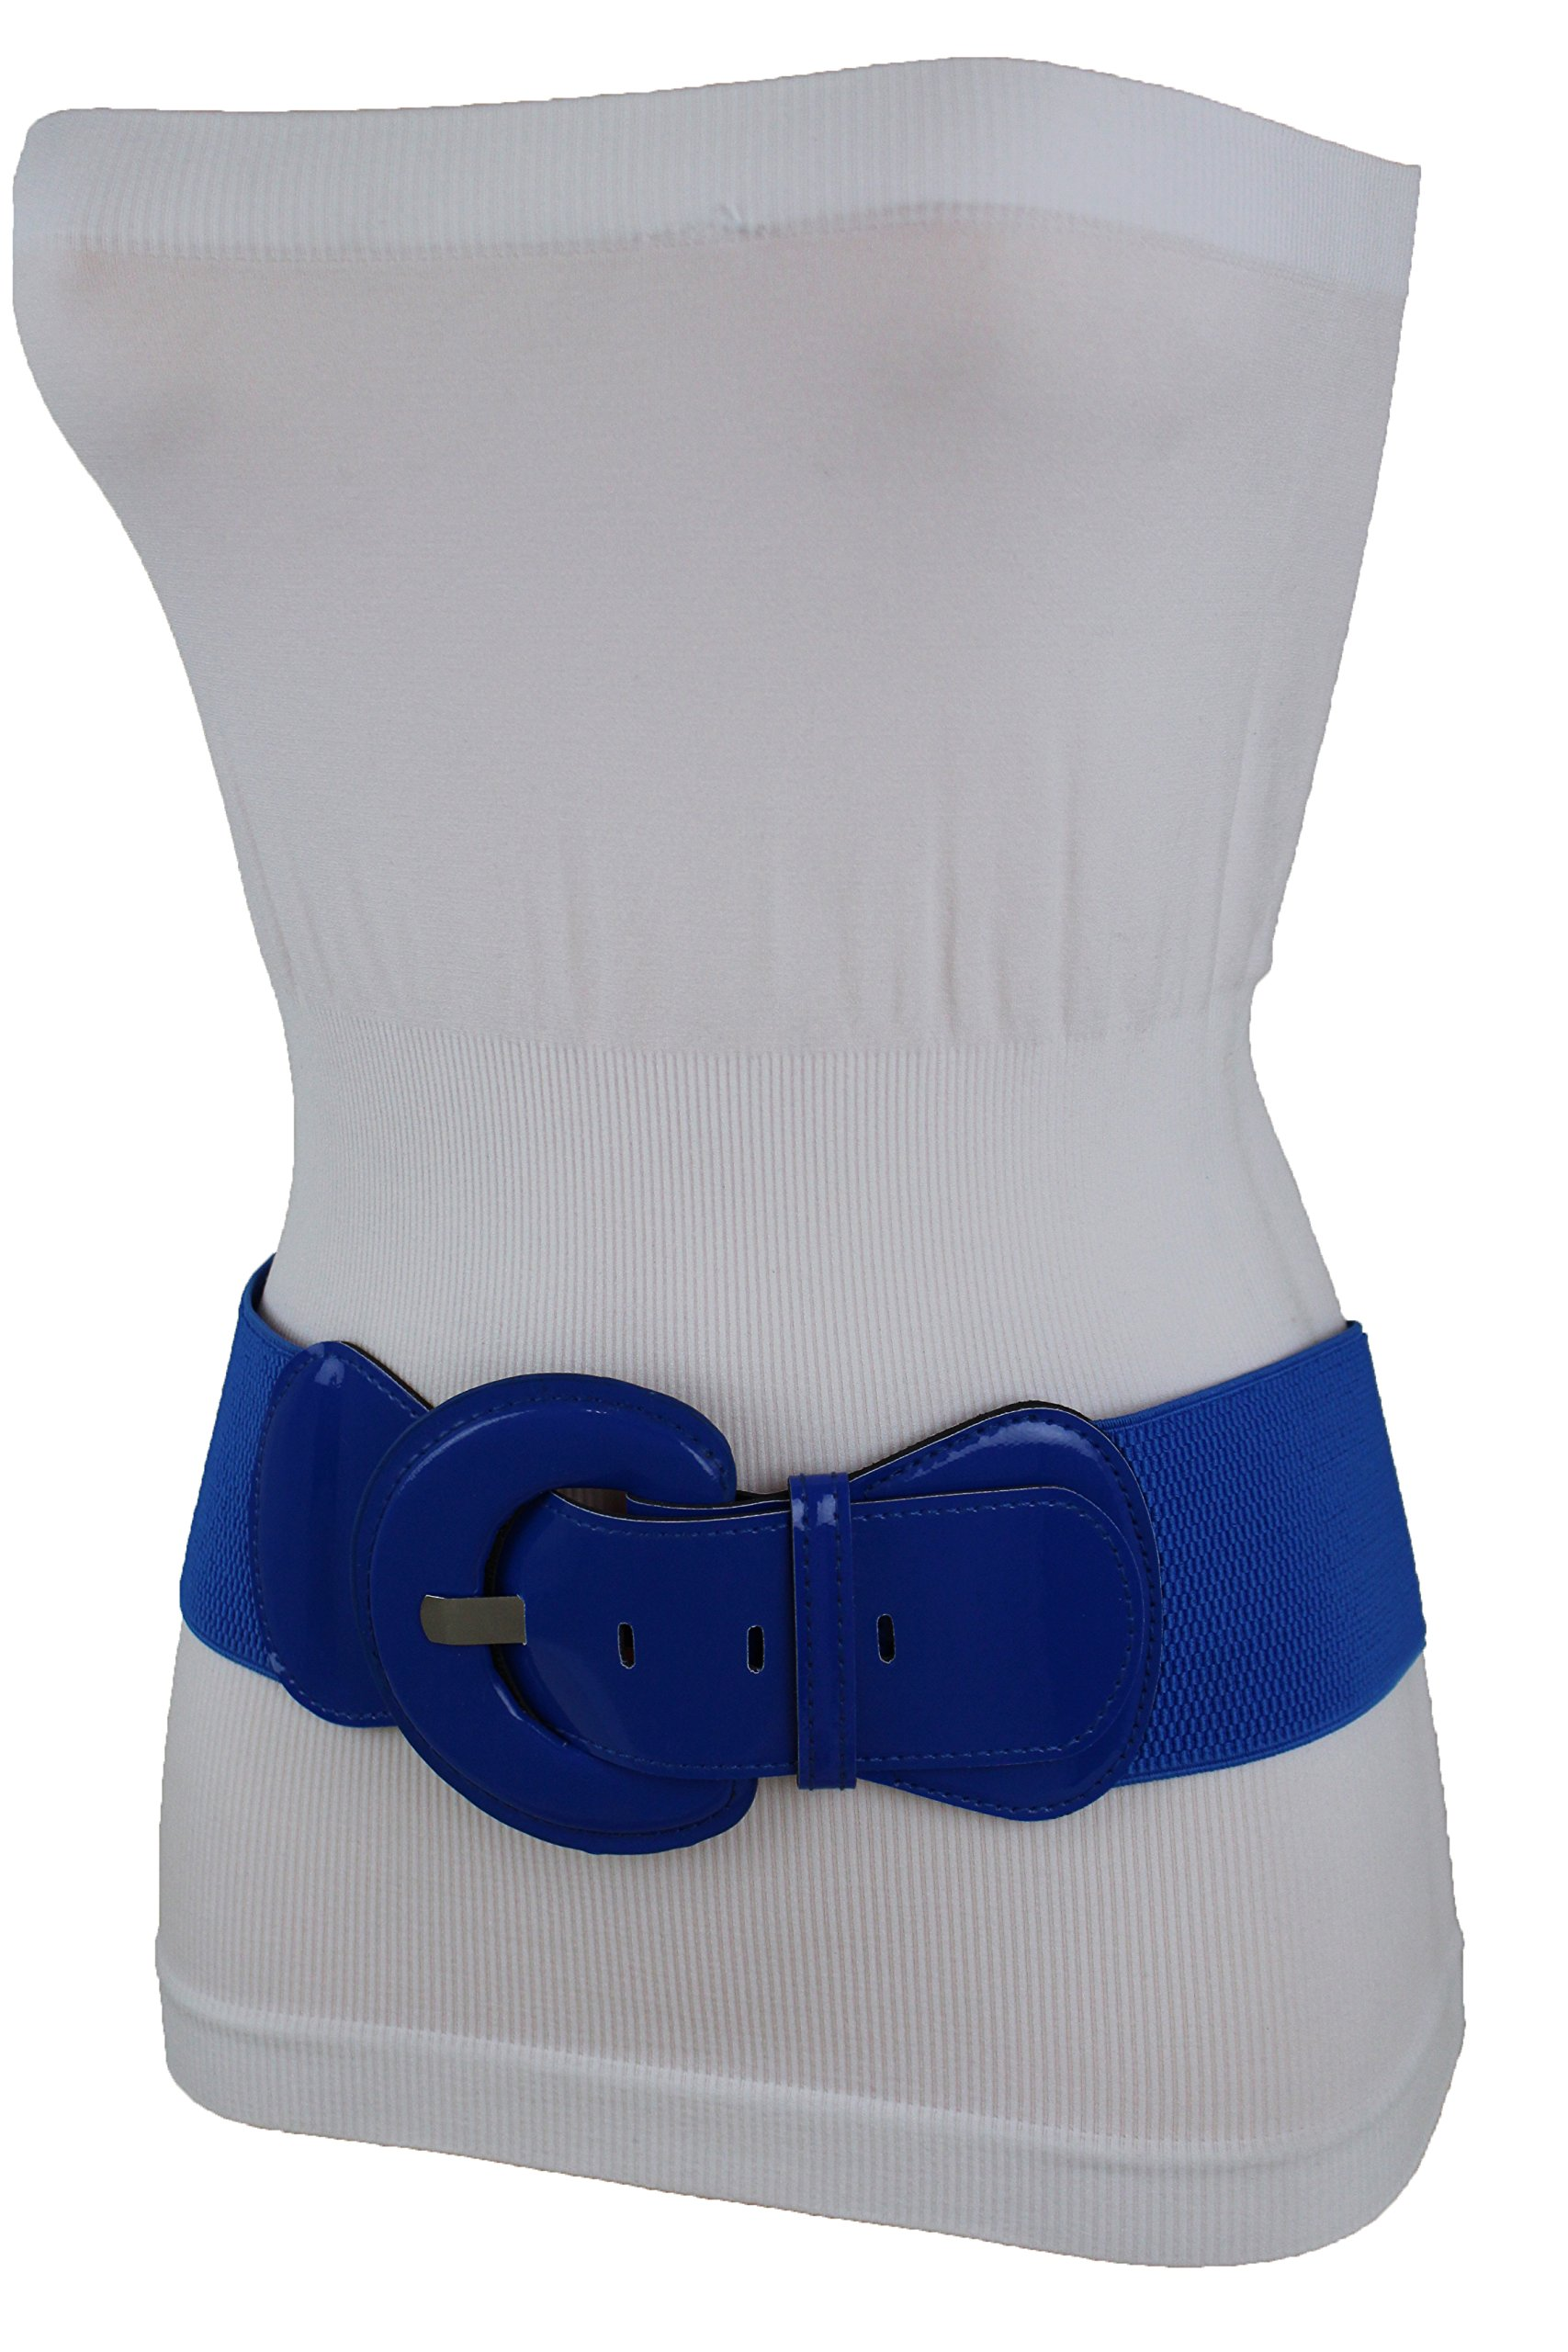 TFJ Women Stretch Wide Belt High Waist Hip Big Round Buckle Plus M L XL Royal Blue